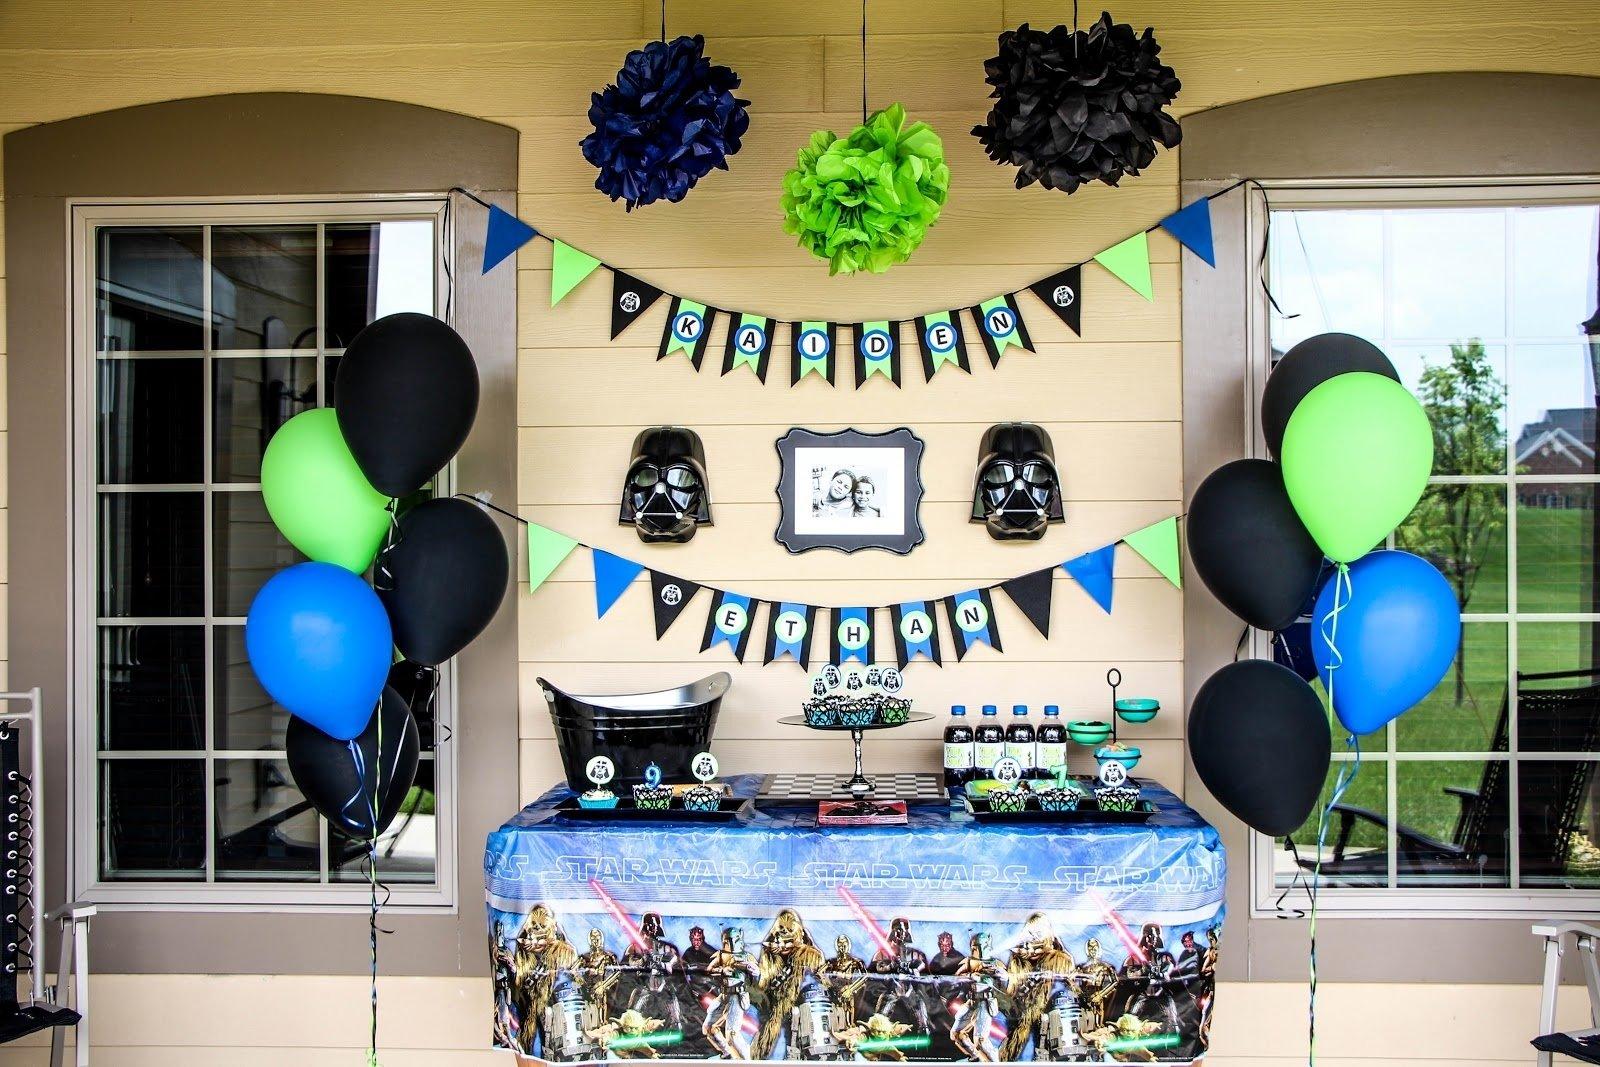 10 Lovely Star Wars Birthday Party Ideas star wars birthday party ideas prom dresses and beauty 2020